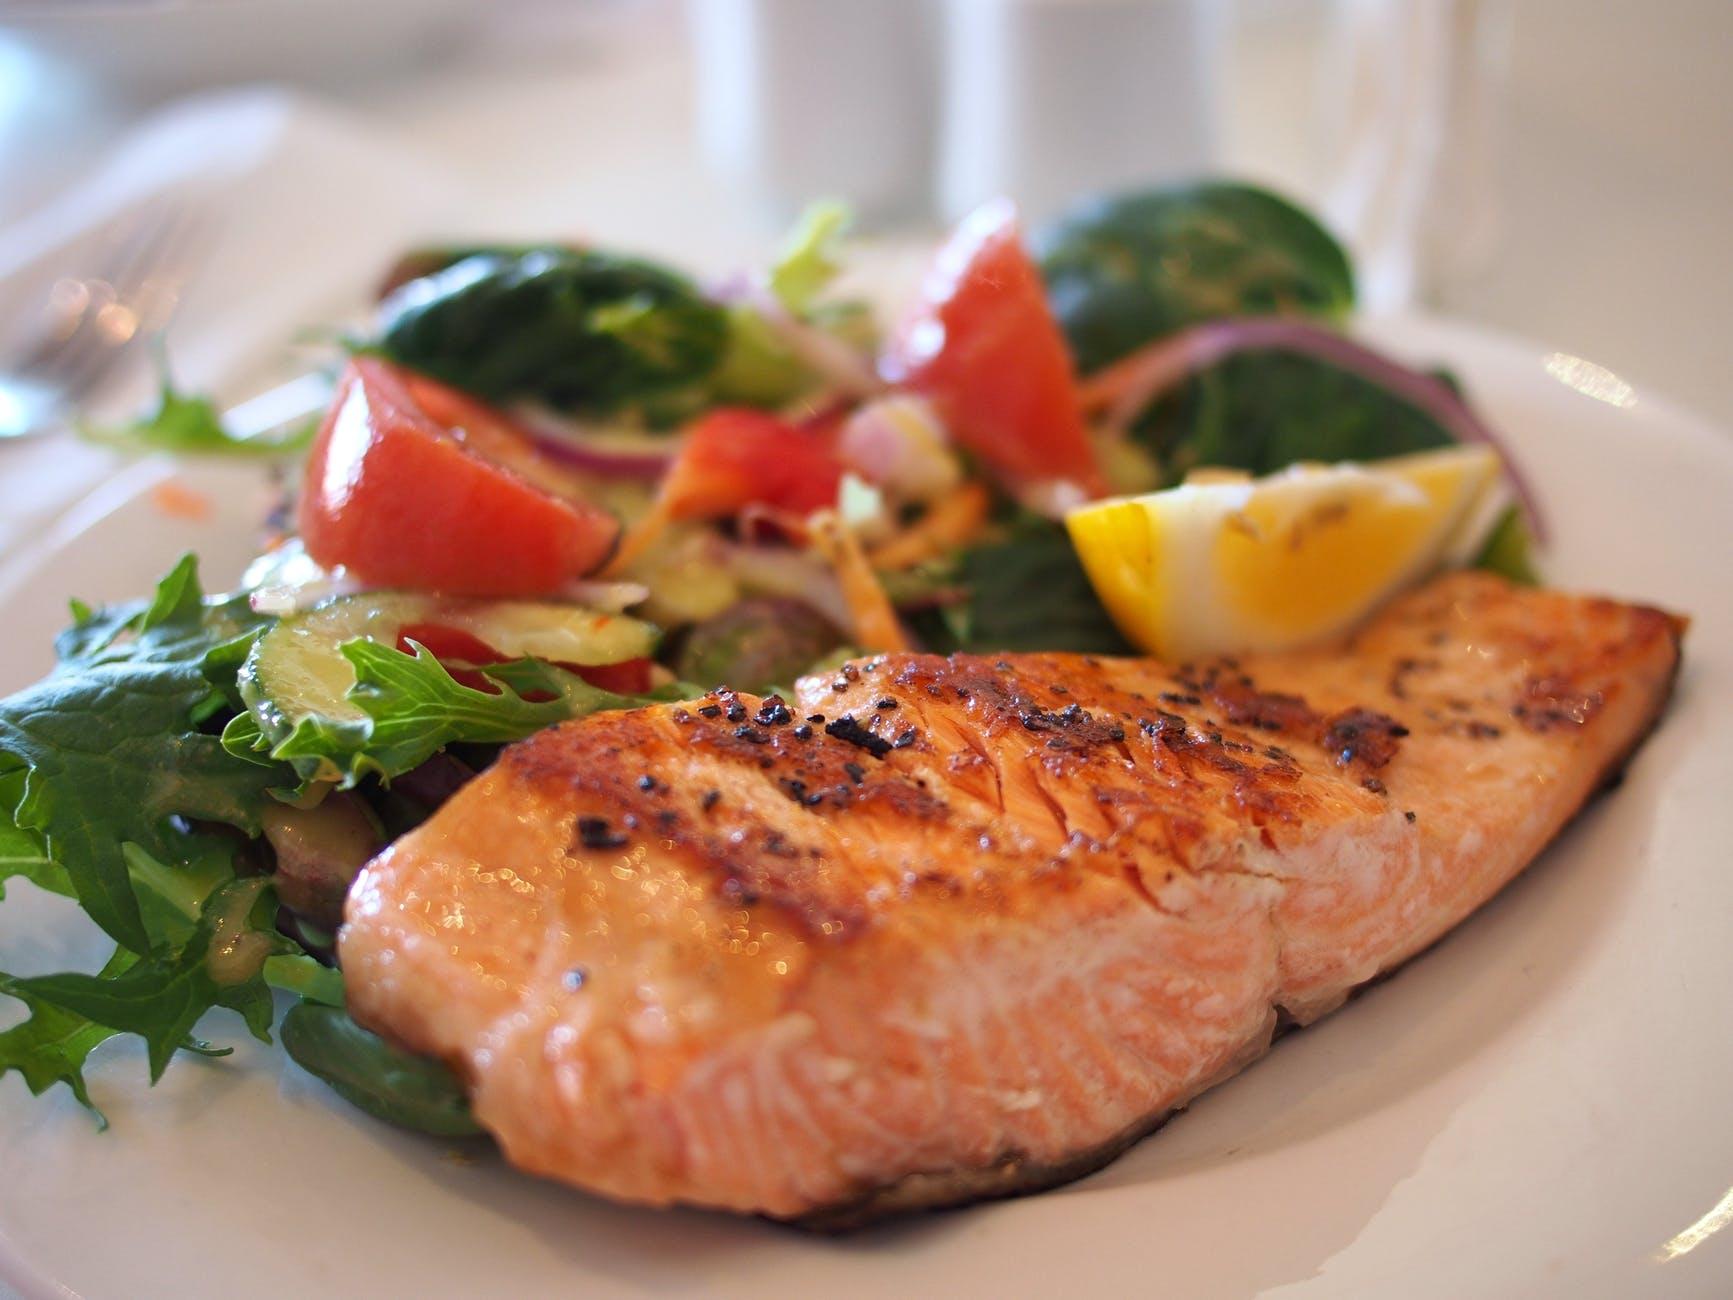 esempi di menu per la dieta accelerata del metabolismo